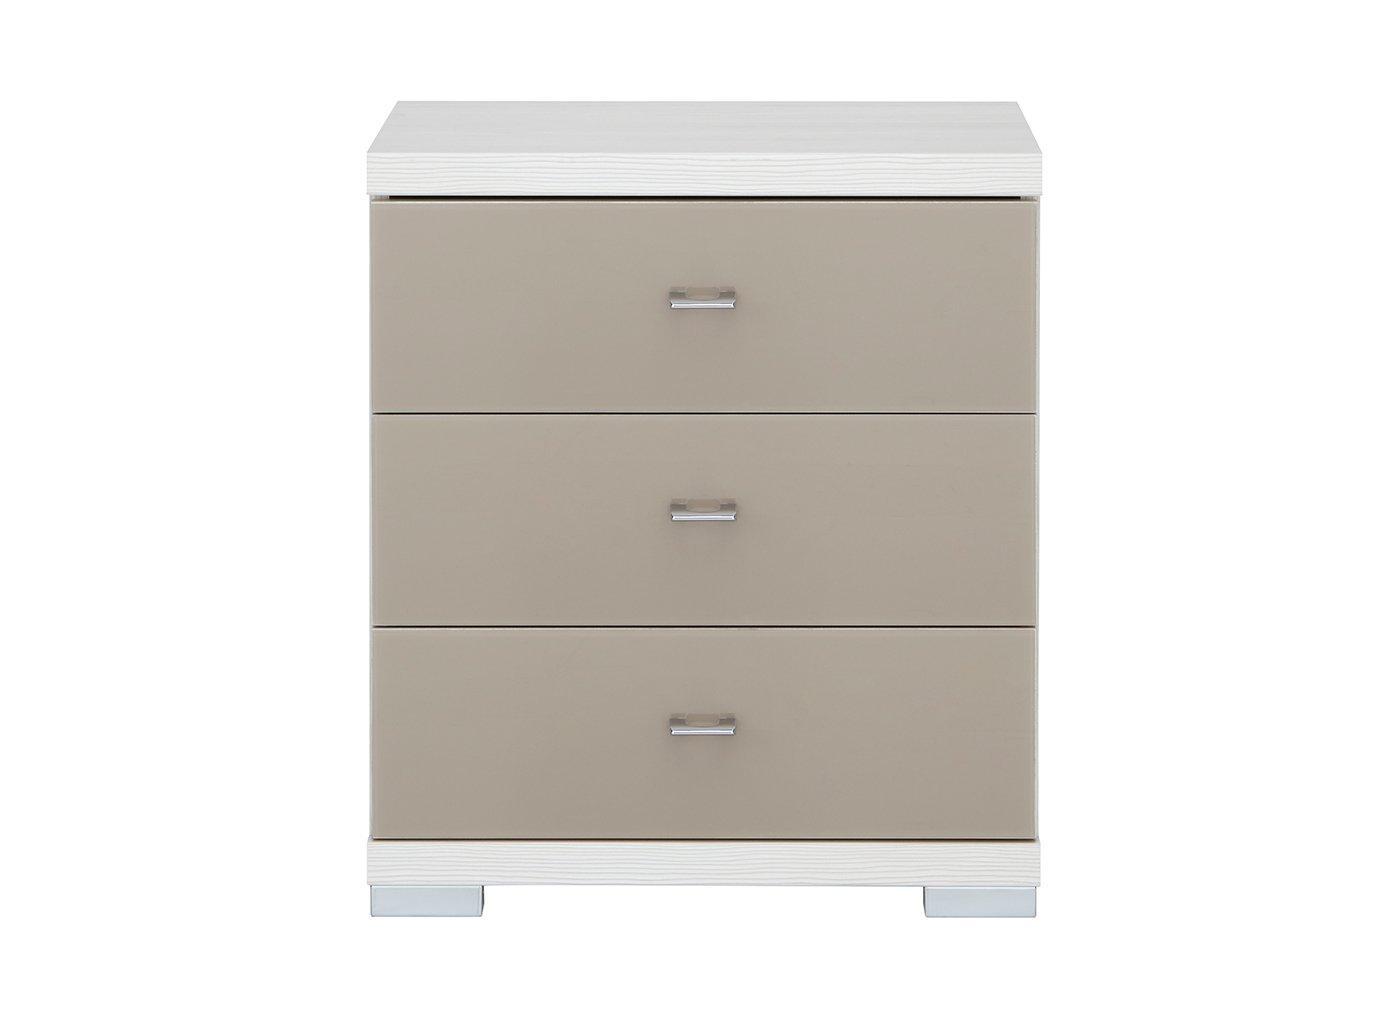 fiji-3-drawer-bedside-chest-polar---sahara